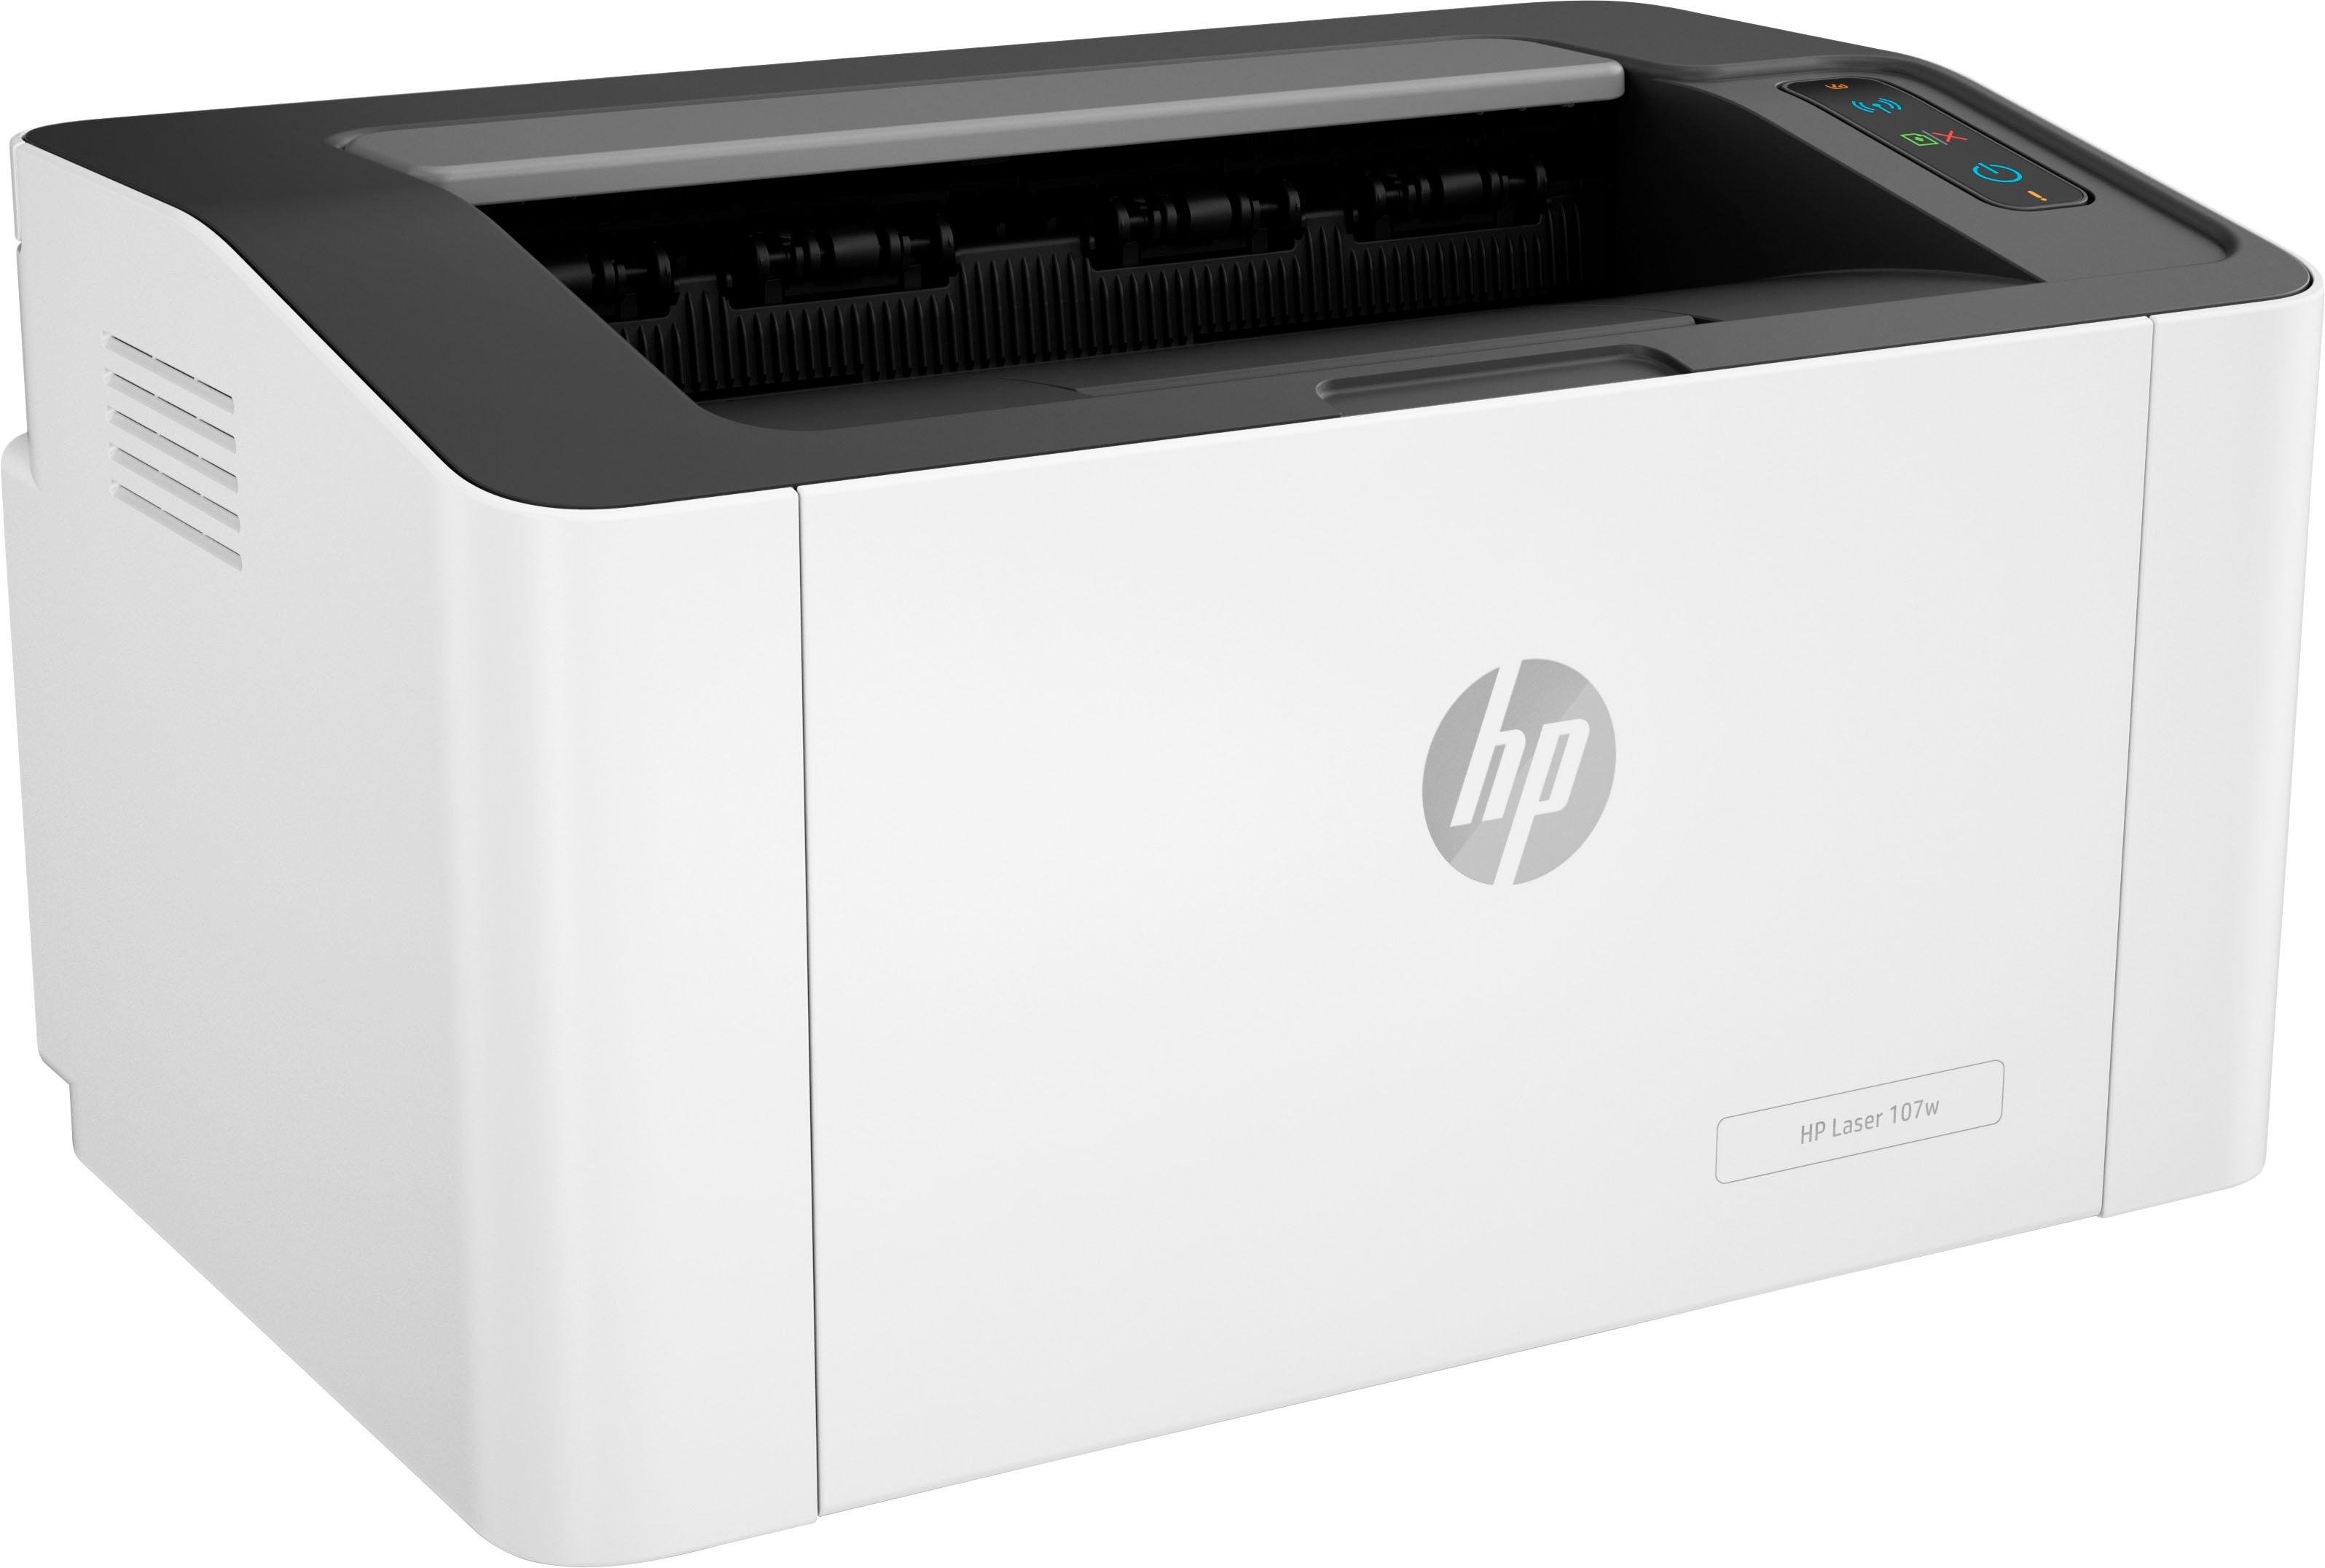 HP »107w« laserprinter nu online bestellen